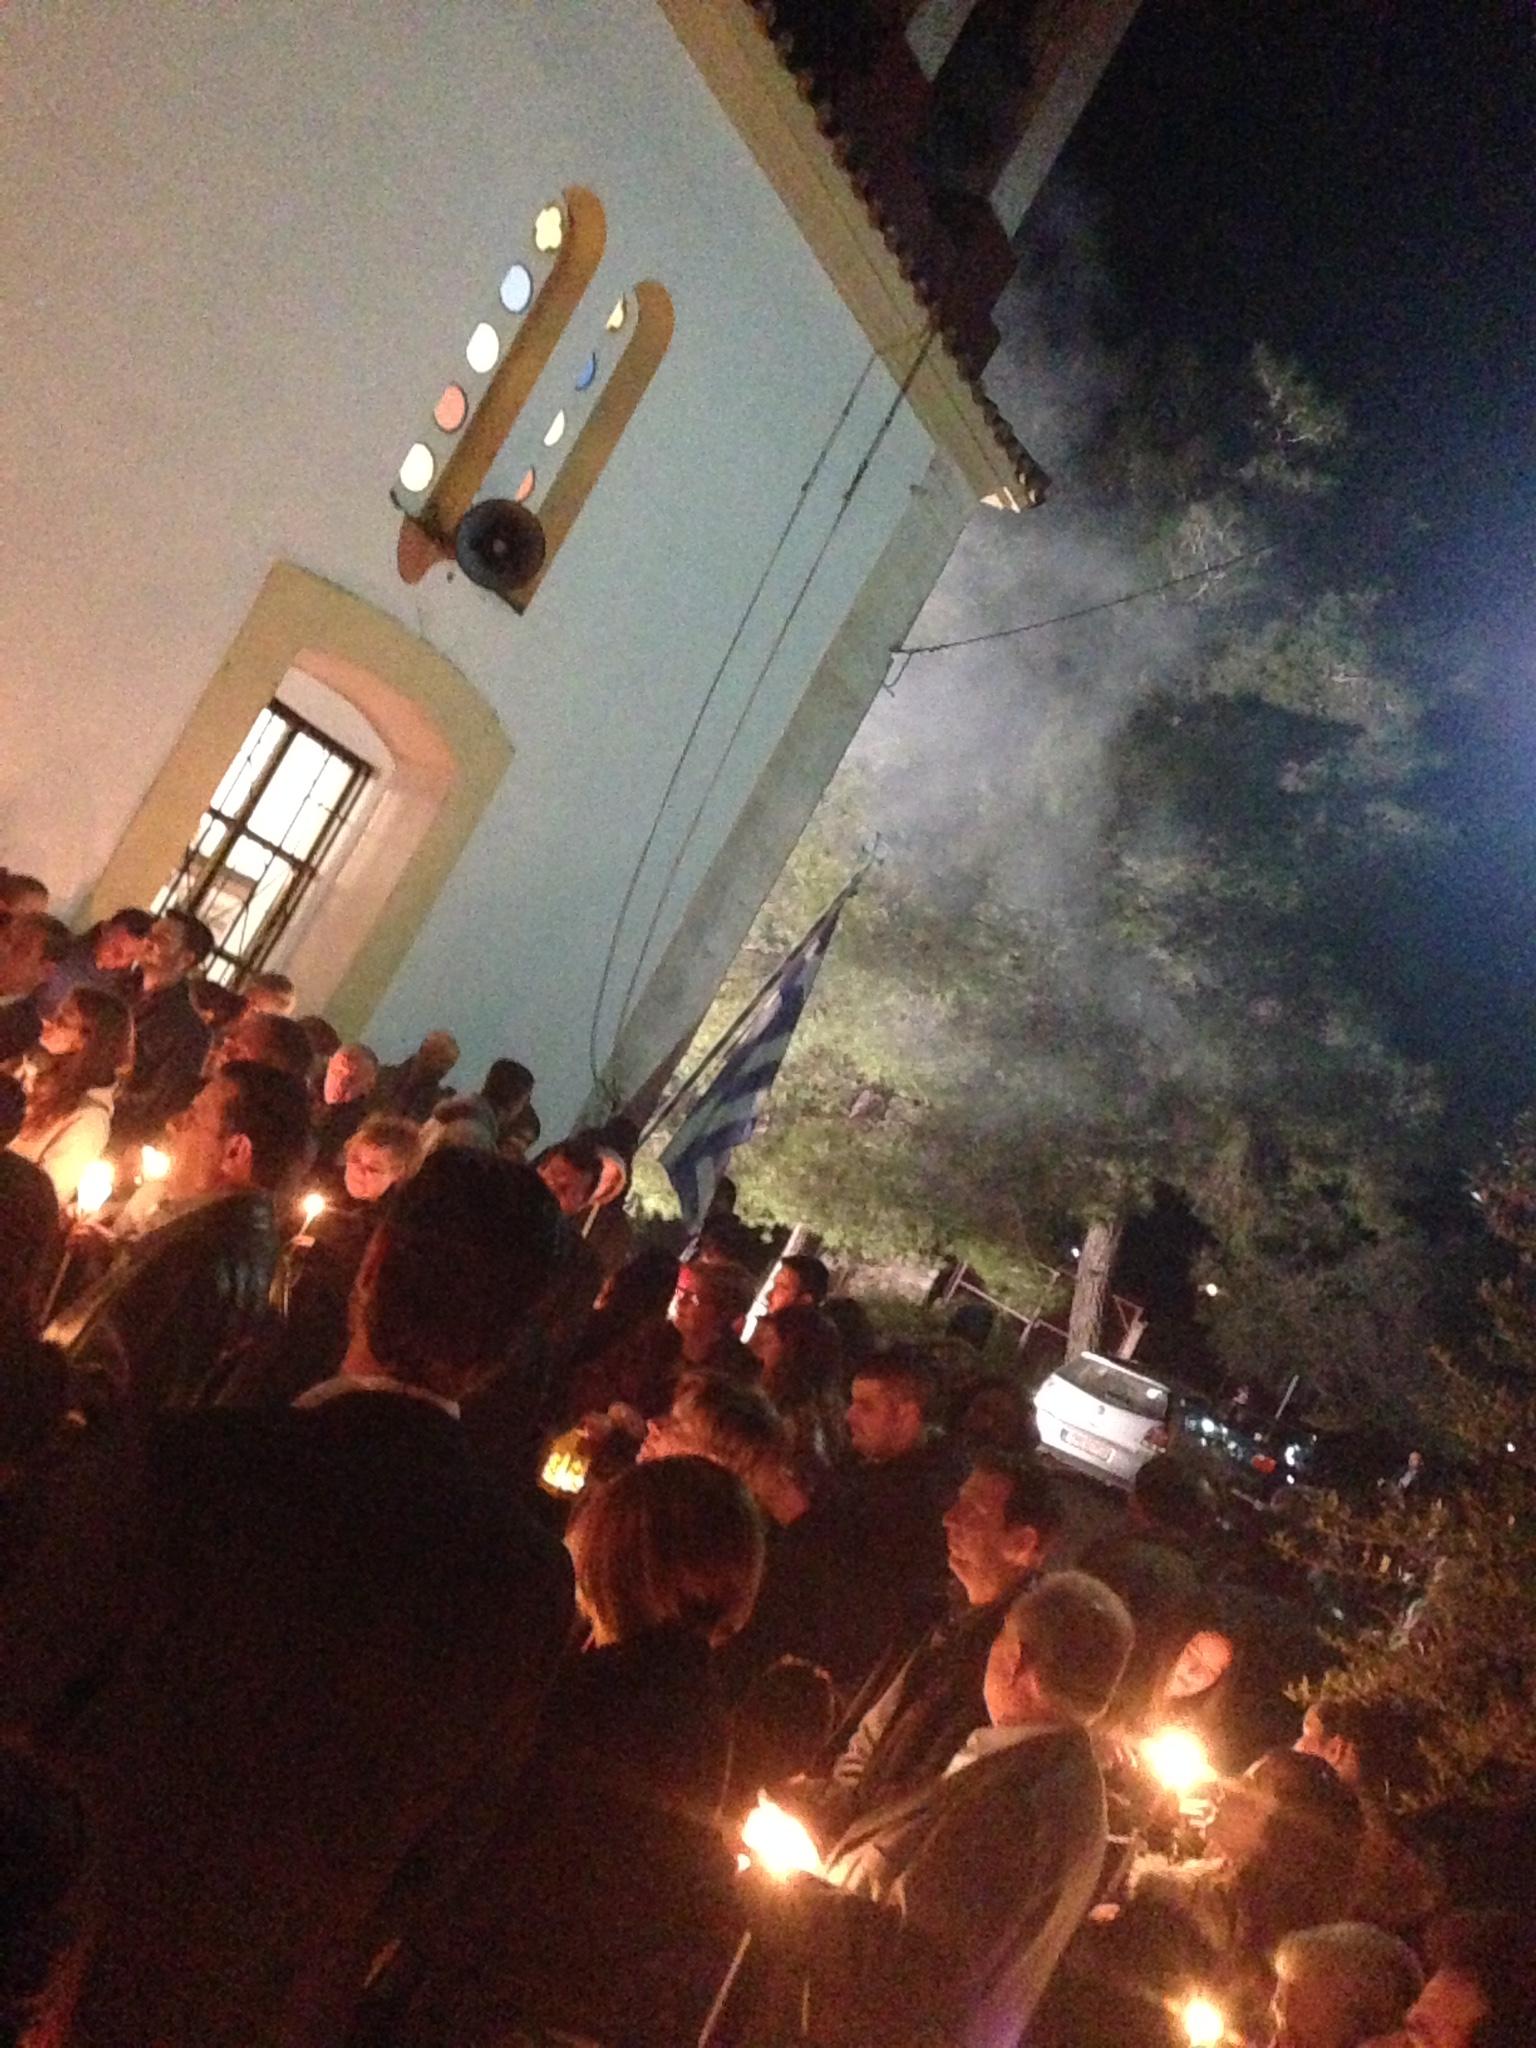 grekisk ortodox påsk 2015